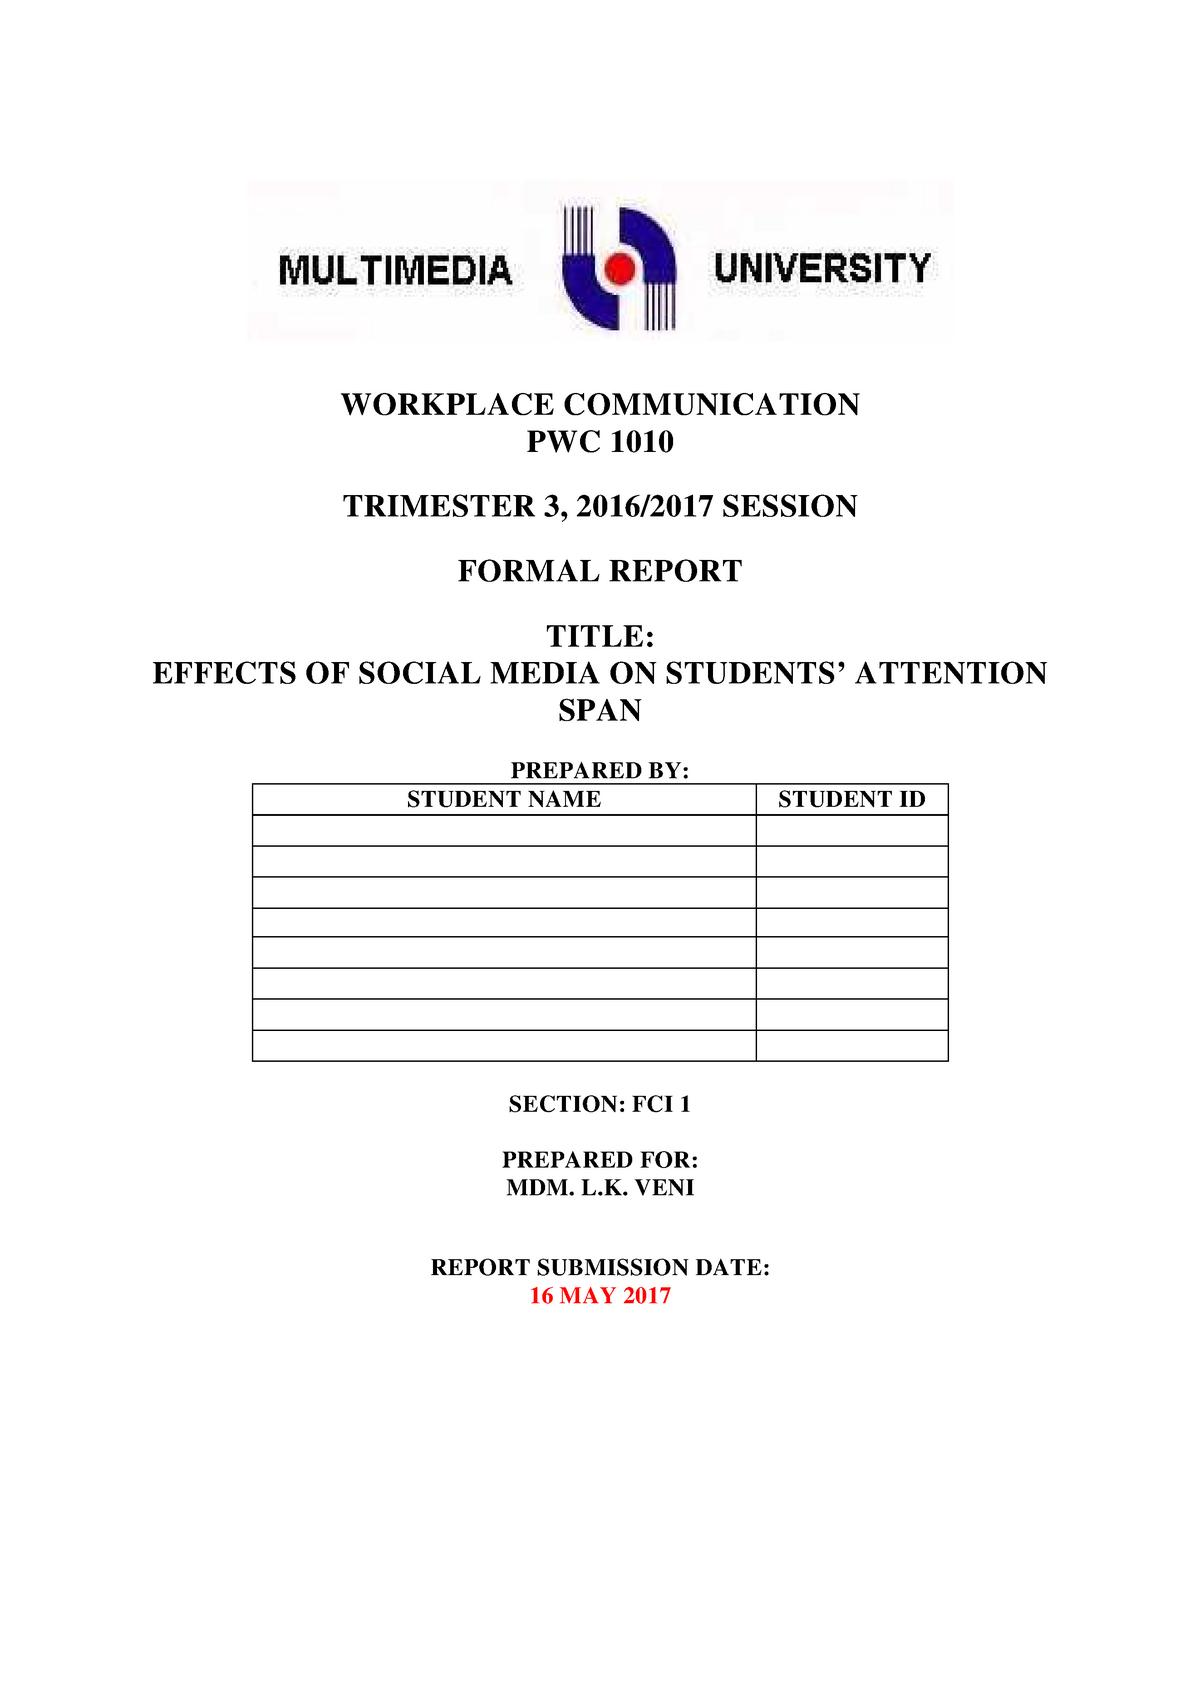 Assignment Formal Report Sample Studocu